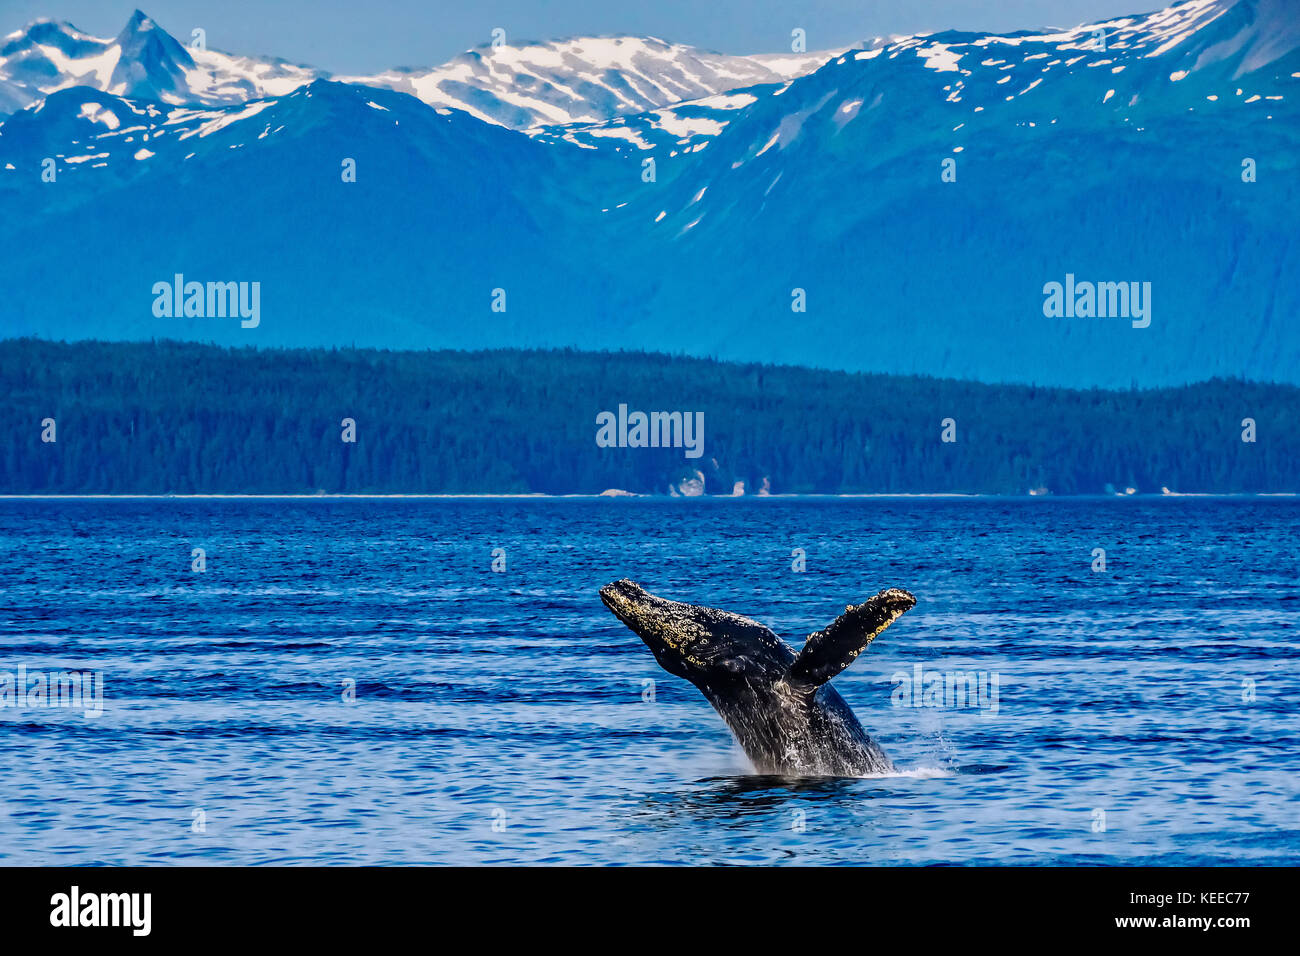 Humpback whale breaching off the coast of Alaska - Stock Image